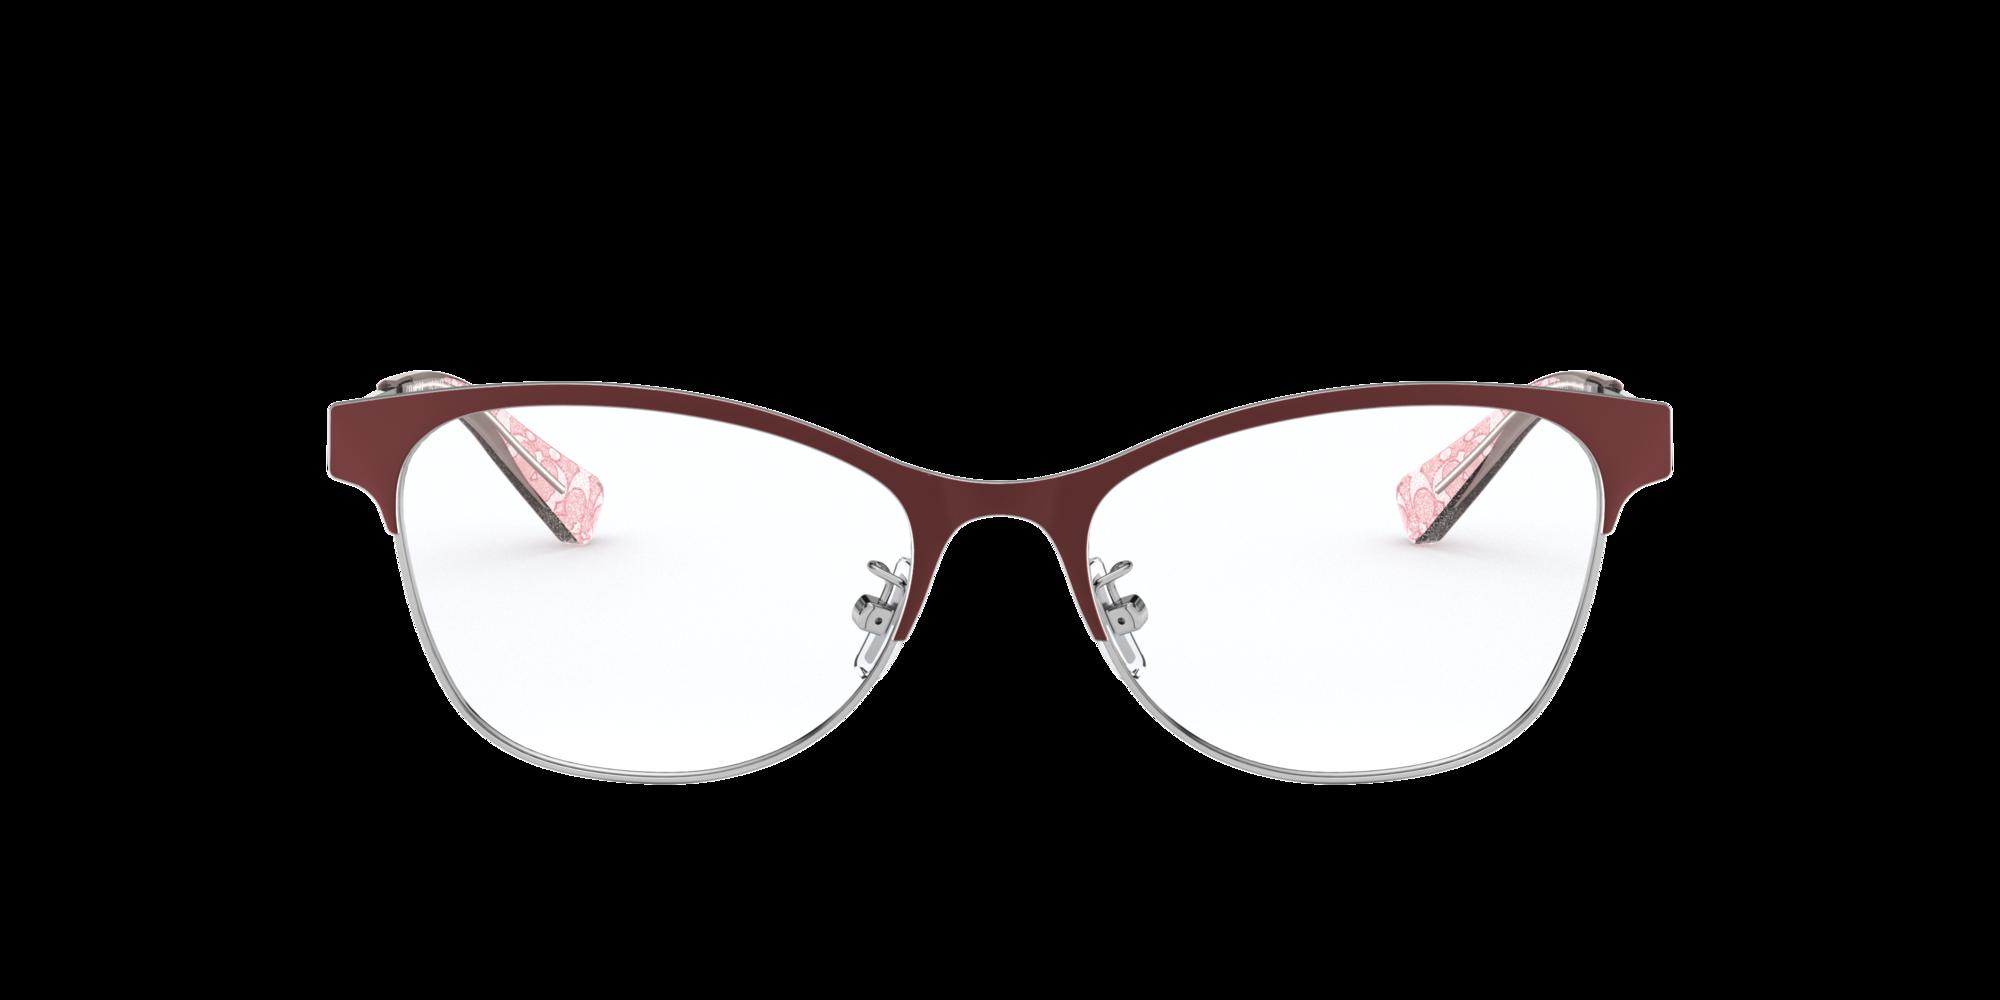 Image for HC5111 from LensCrafters | Glasses, Prescription Glasses Online, Eyewear